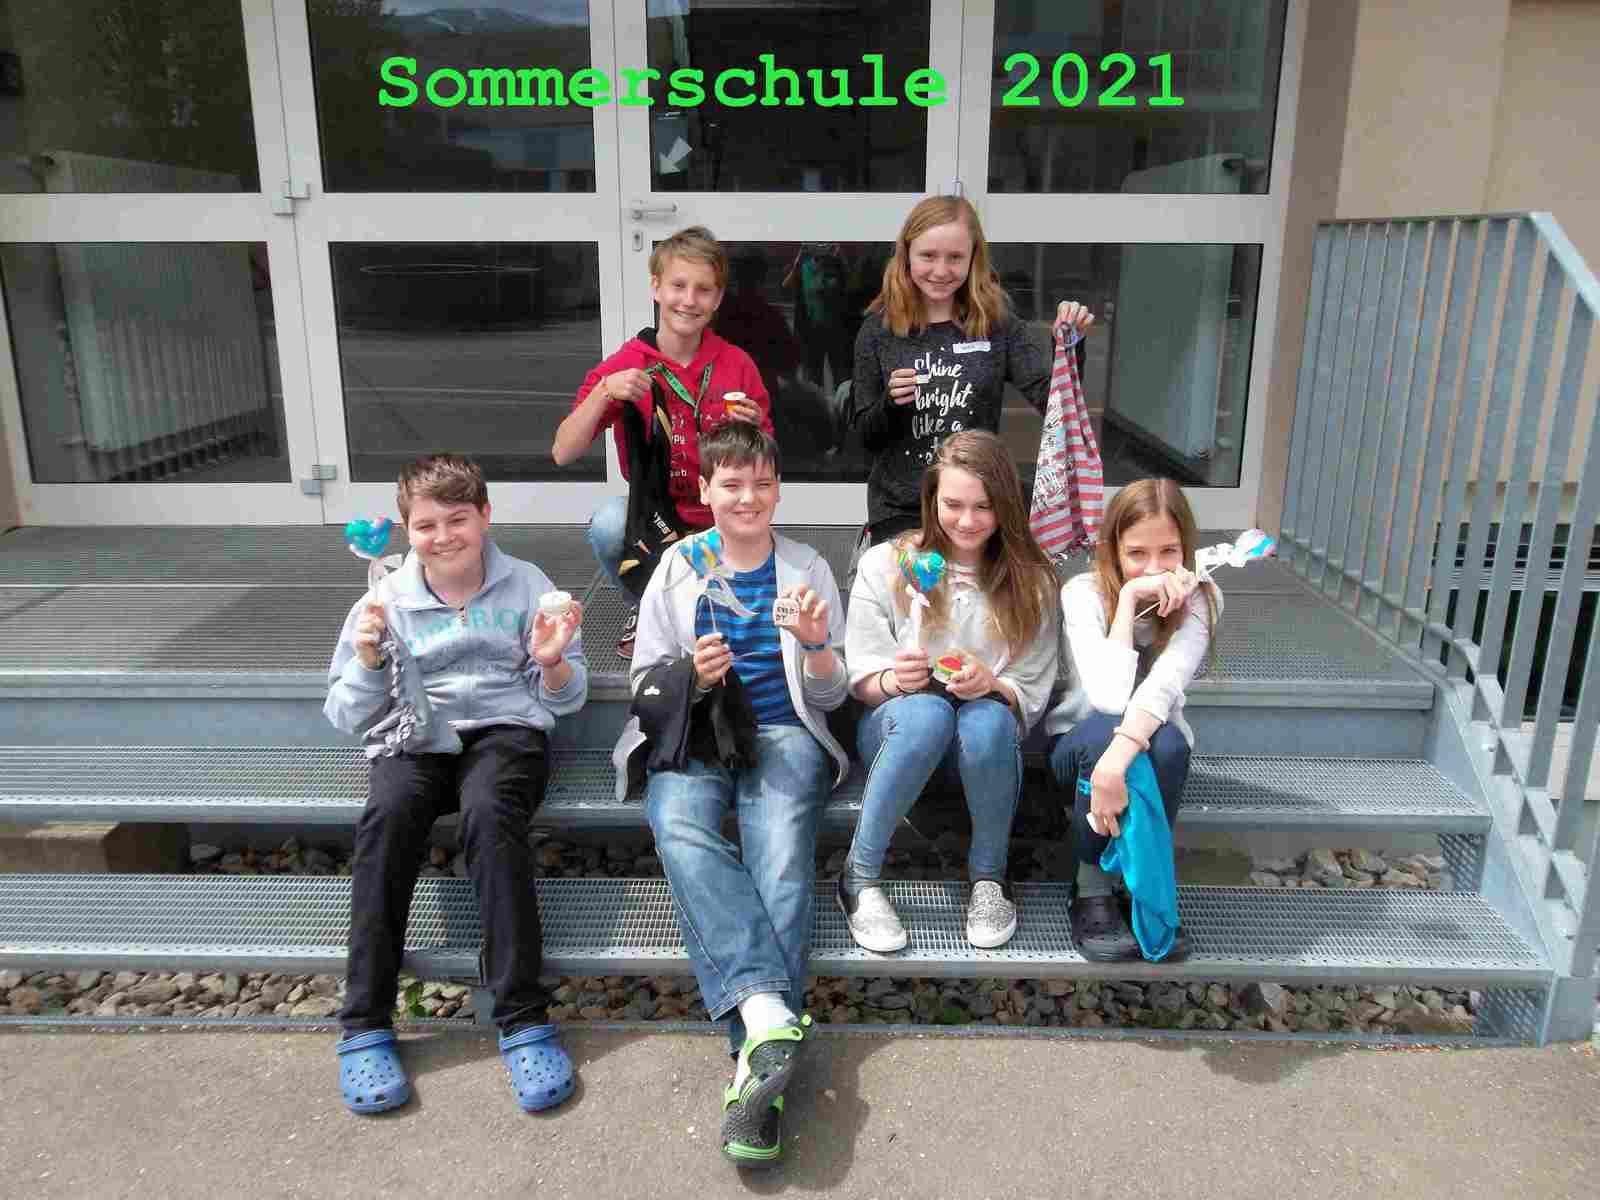 Sommerschule 2021 an der MS Neumarkt<br /><h3 style='font-size: 16px; line-height: 16px !important; margin-top: 5px;'><span style='color: #800000;'>Lernen mit Spaß vom 30. August bis 10. Sept. 2021</span></h3>